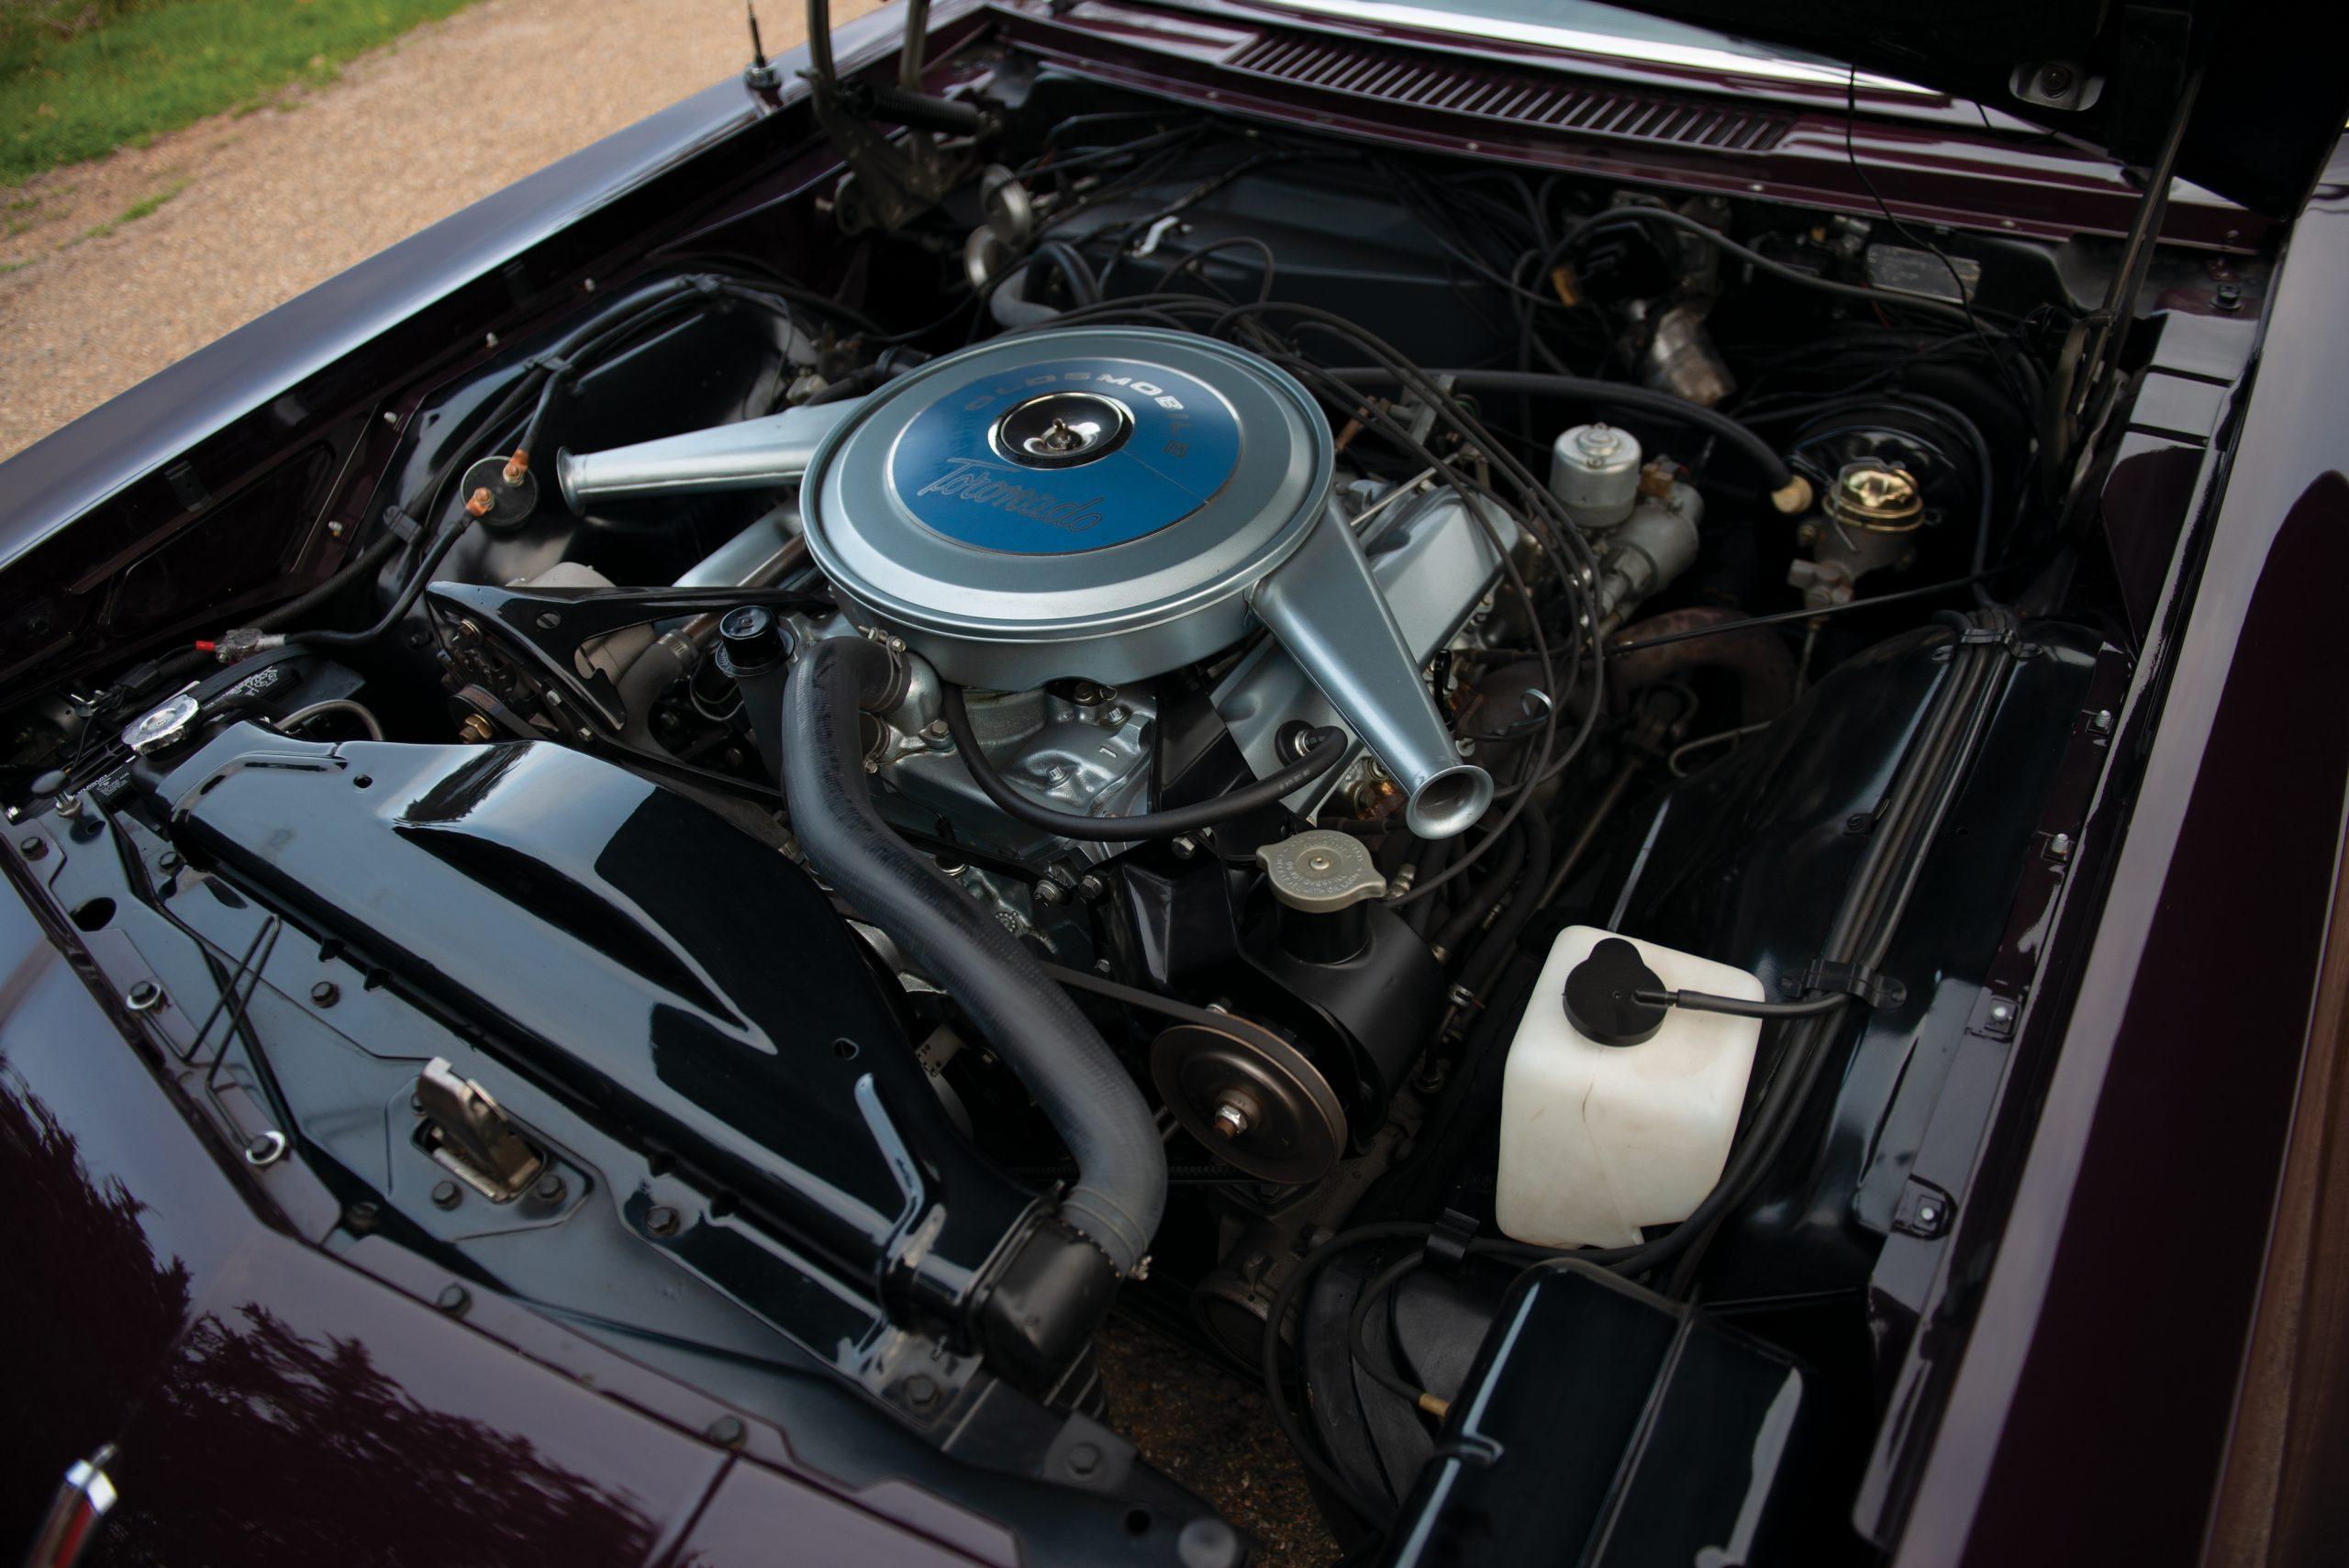 Olds Toronado engine bay